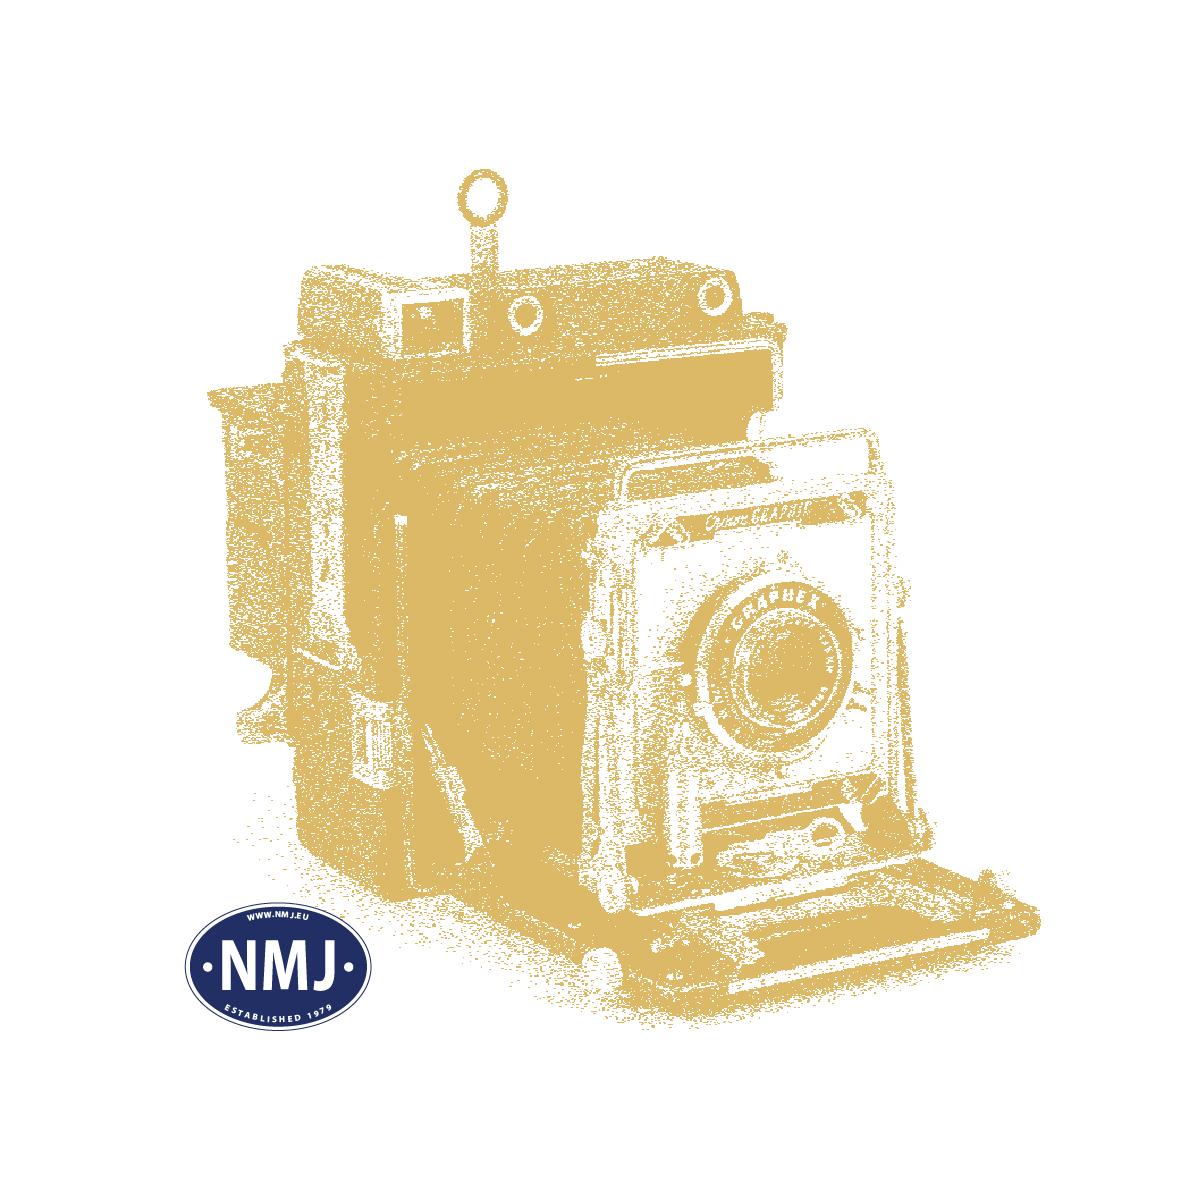 GMKAL18 - Nohab GM Kalender 2018, A3 Format